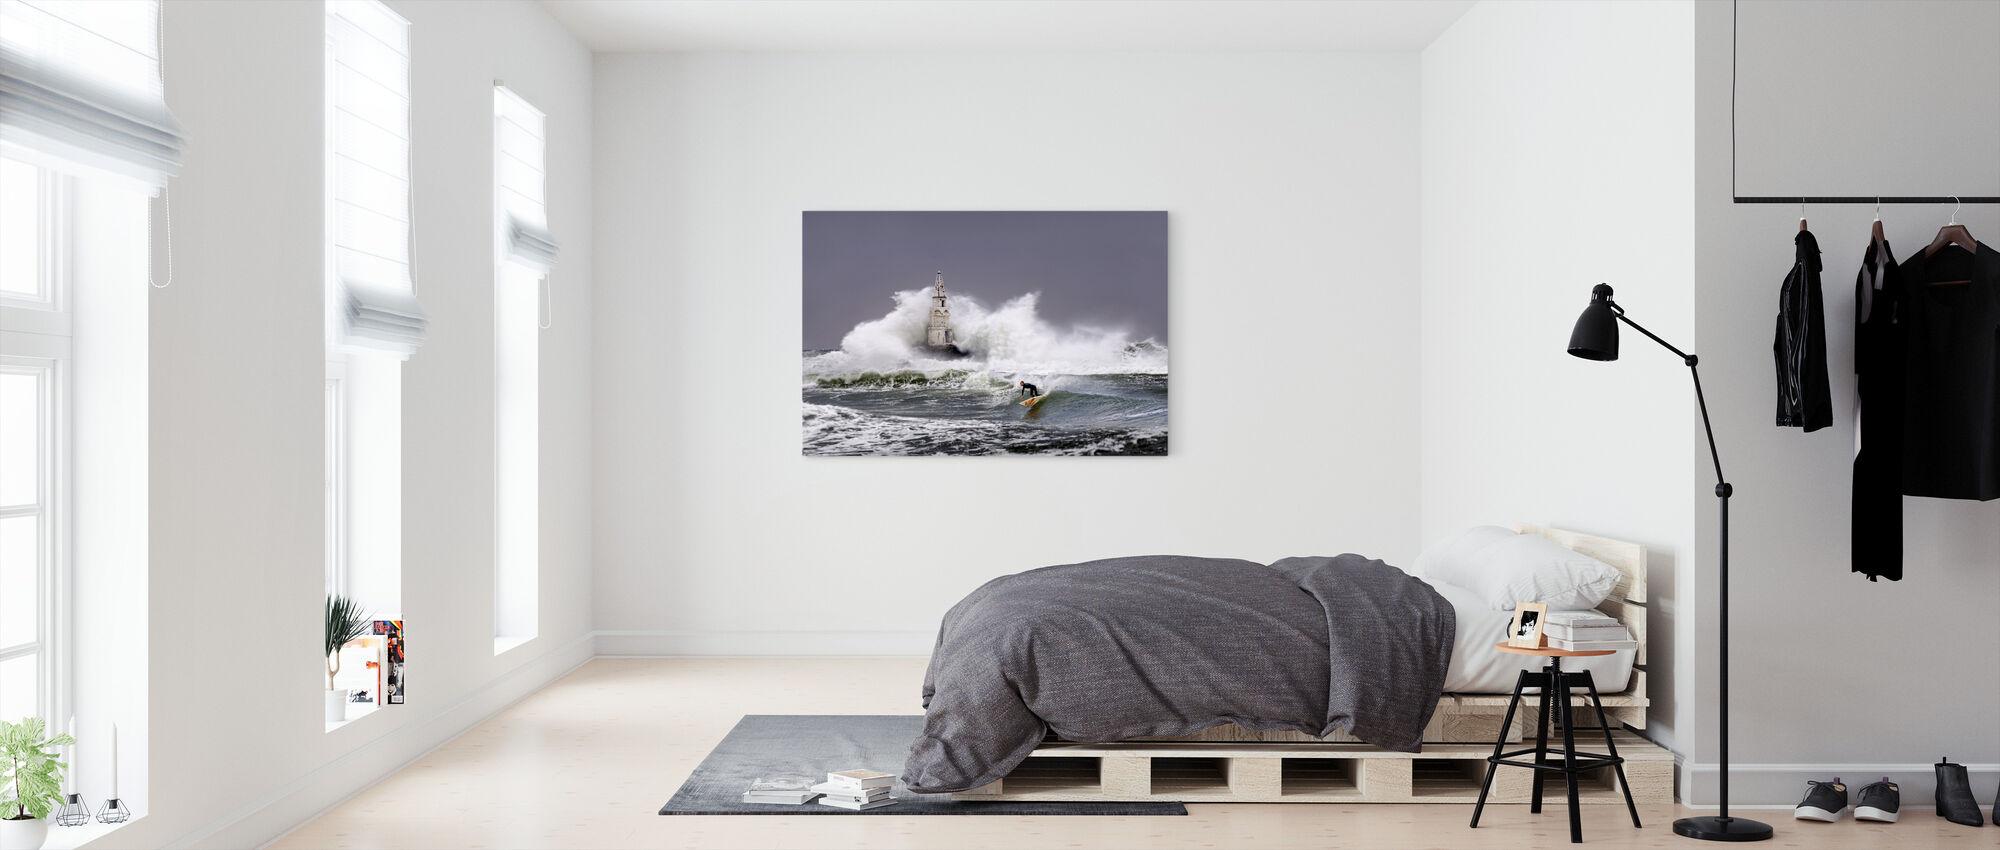 Lighthouse Surfer - Canvas print - Bedroom